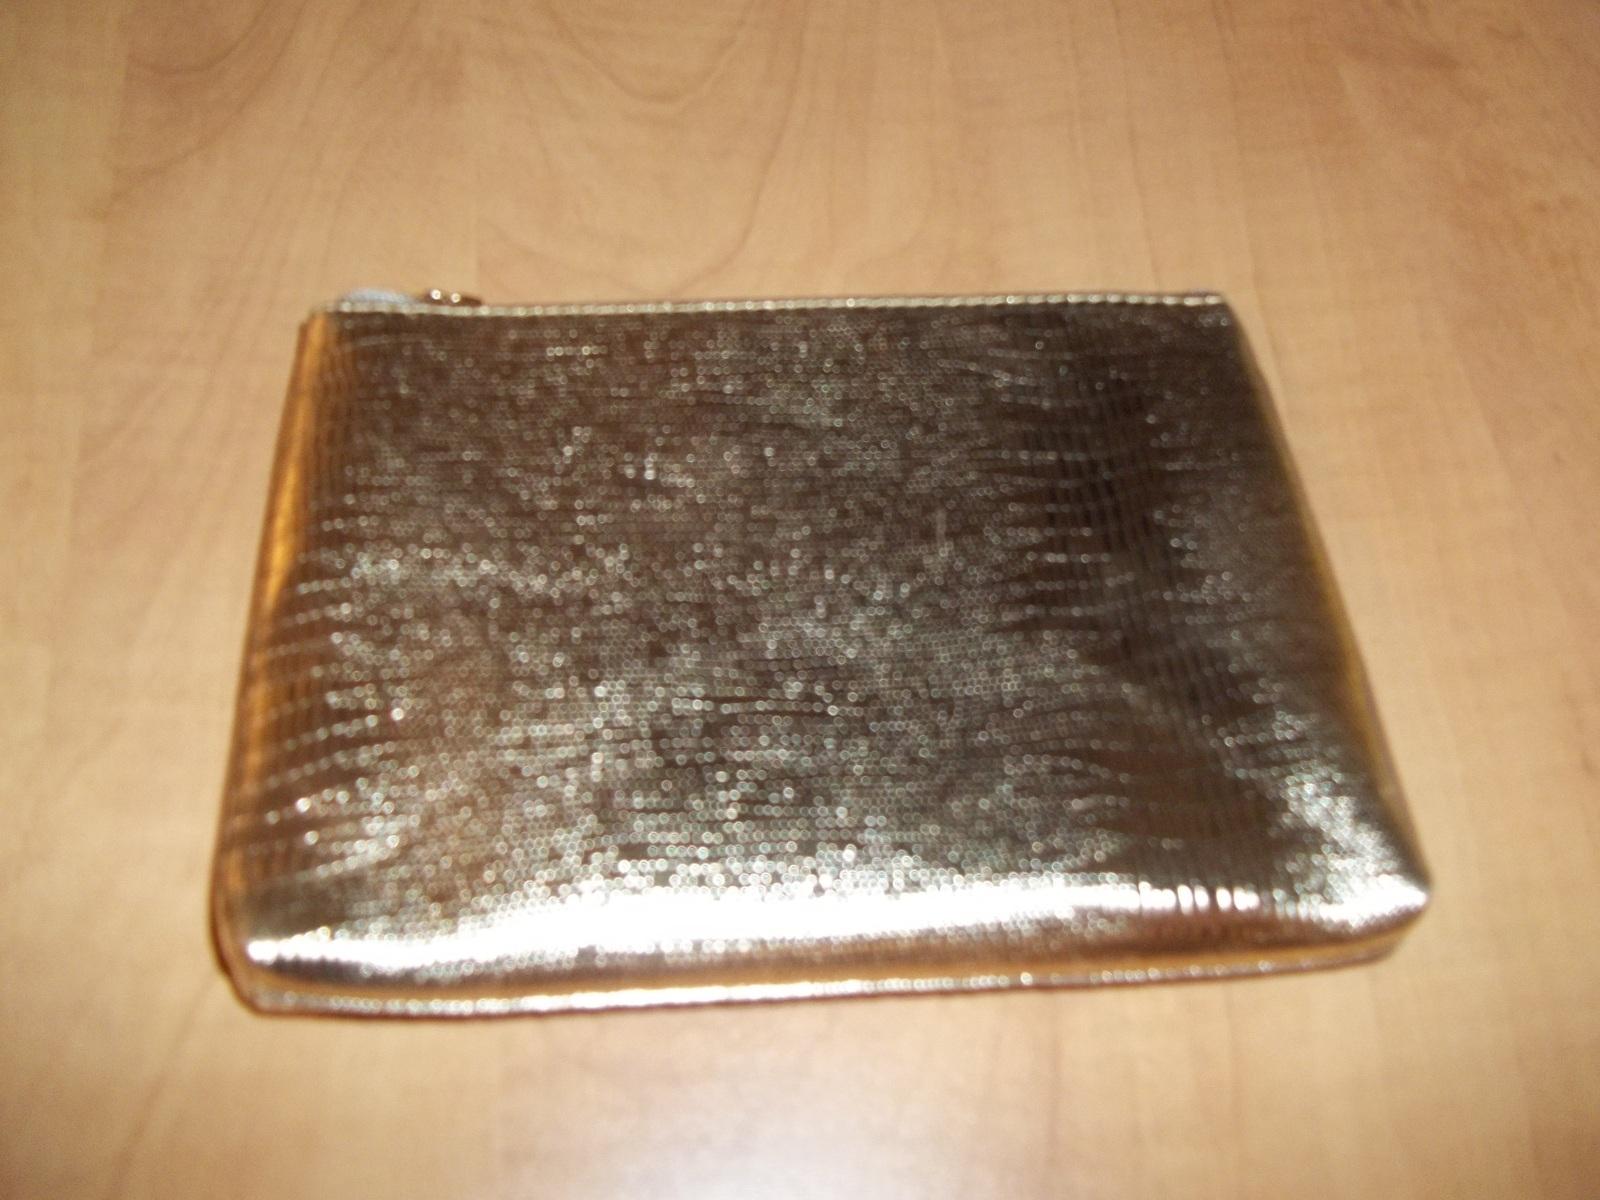 Lancome Cosmetic Bag Gold - $9.99